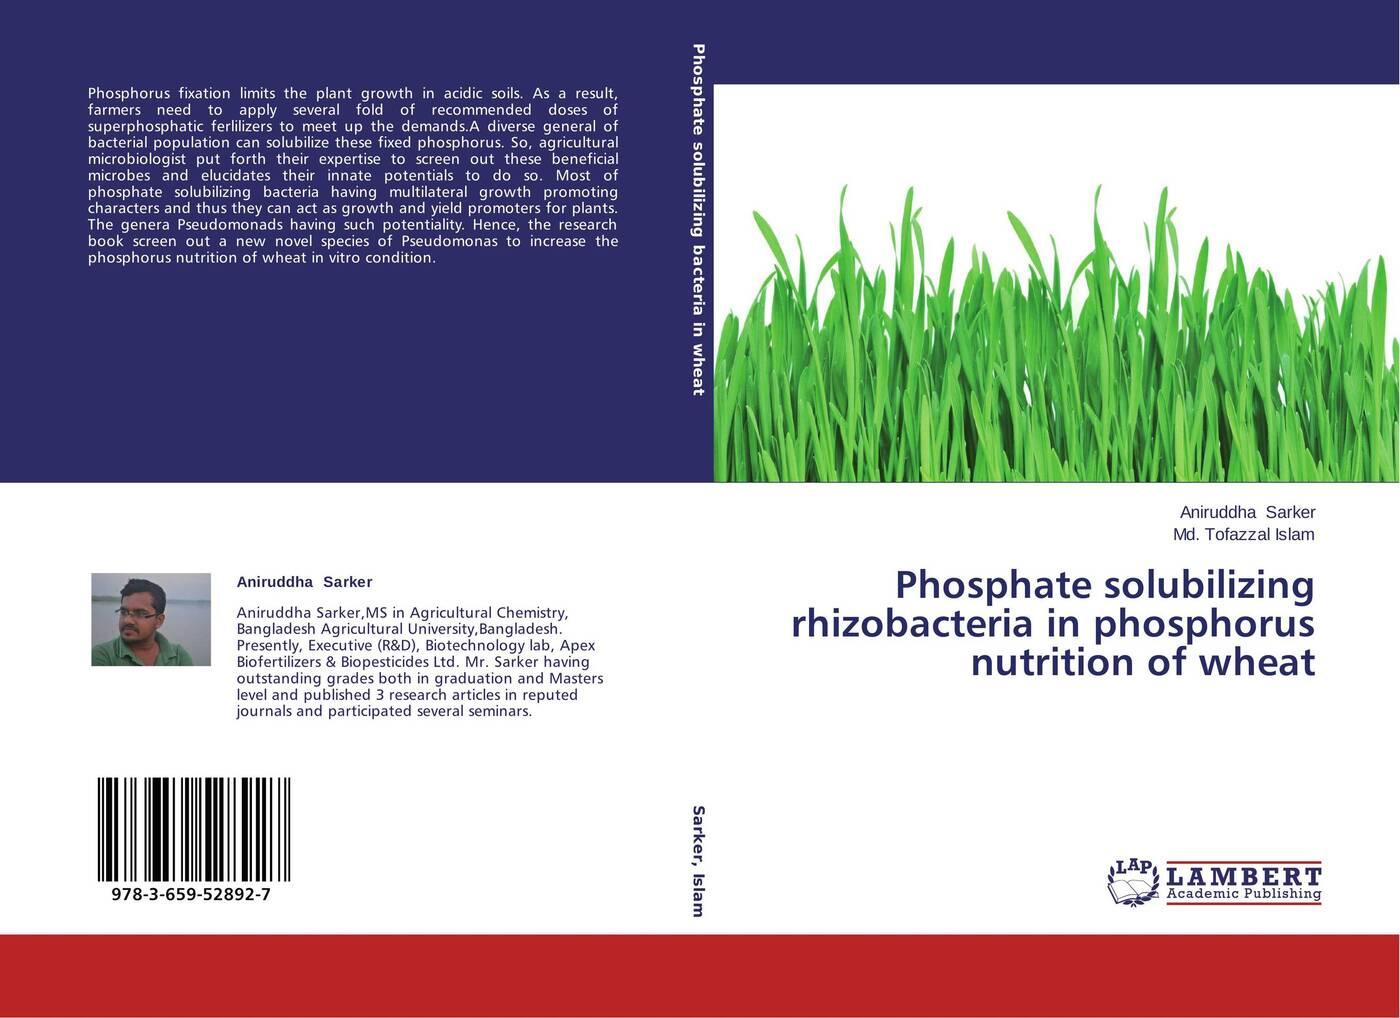 Aniruddha Sarker and Md. Tofazzal Islam Phosphate solubilizing rhizobacteria in phosphorus nutrition of wheat dr moniruzzaman sarker and md mojahedul islam reproductive ecology of freshwater crab